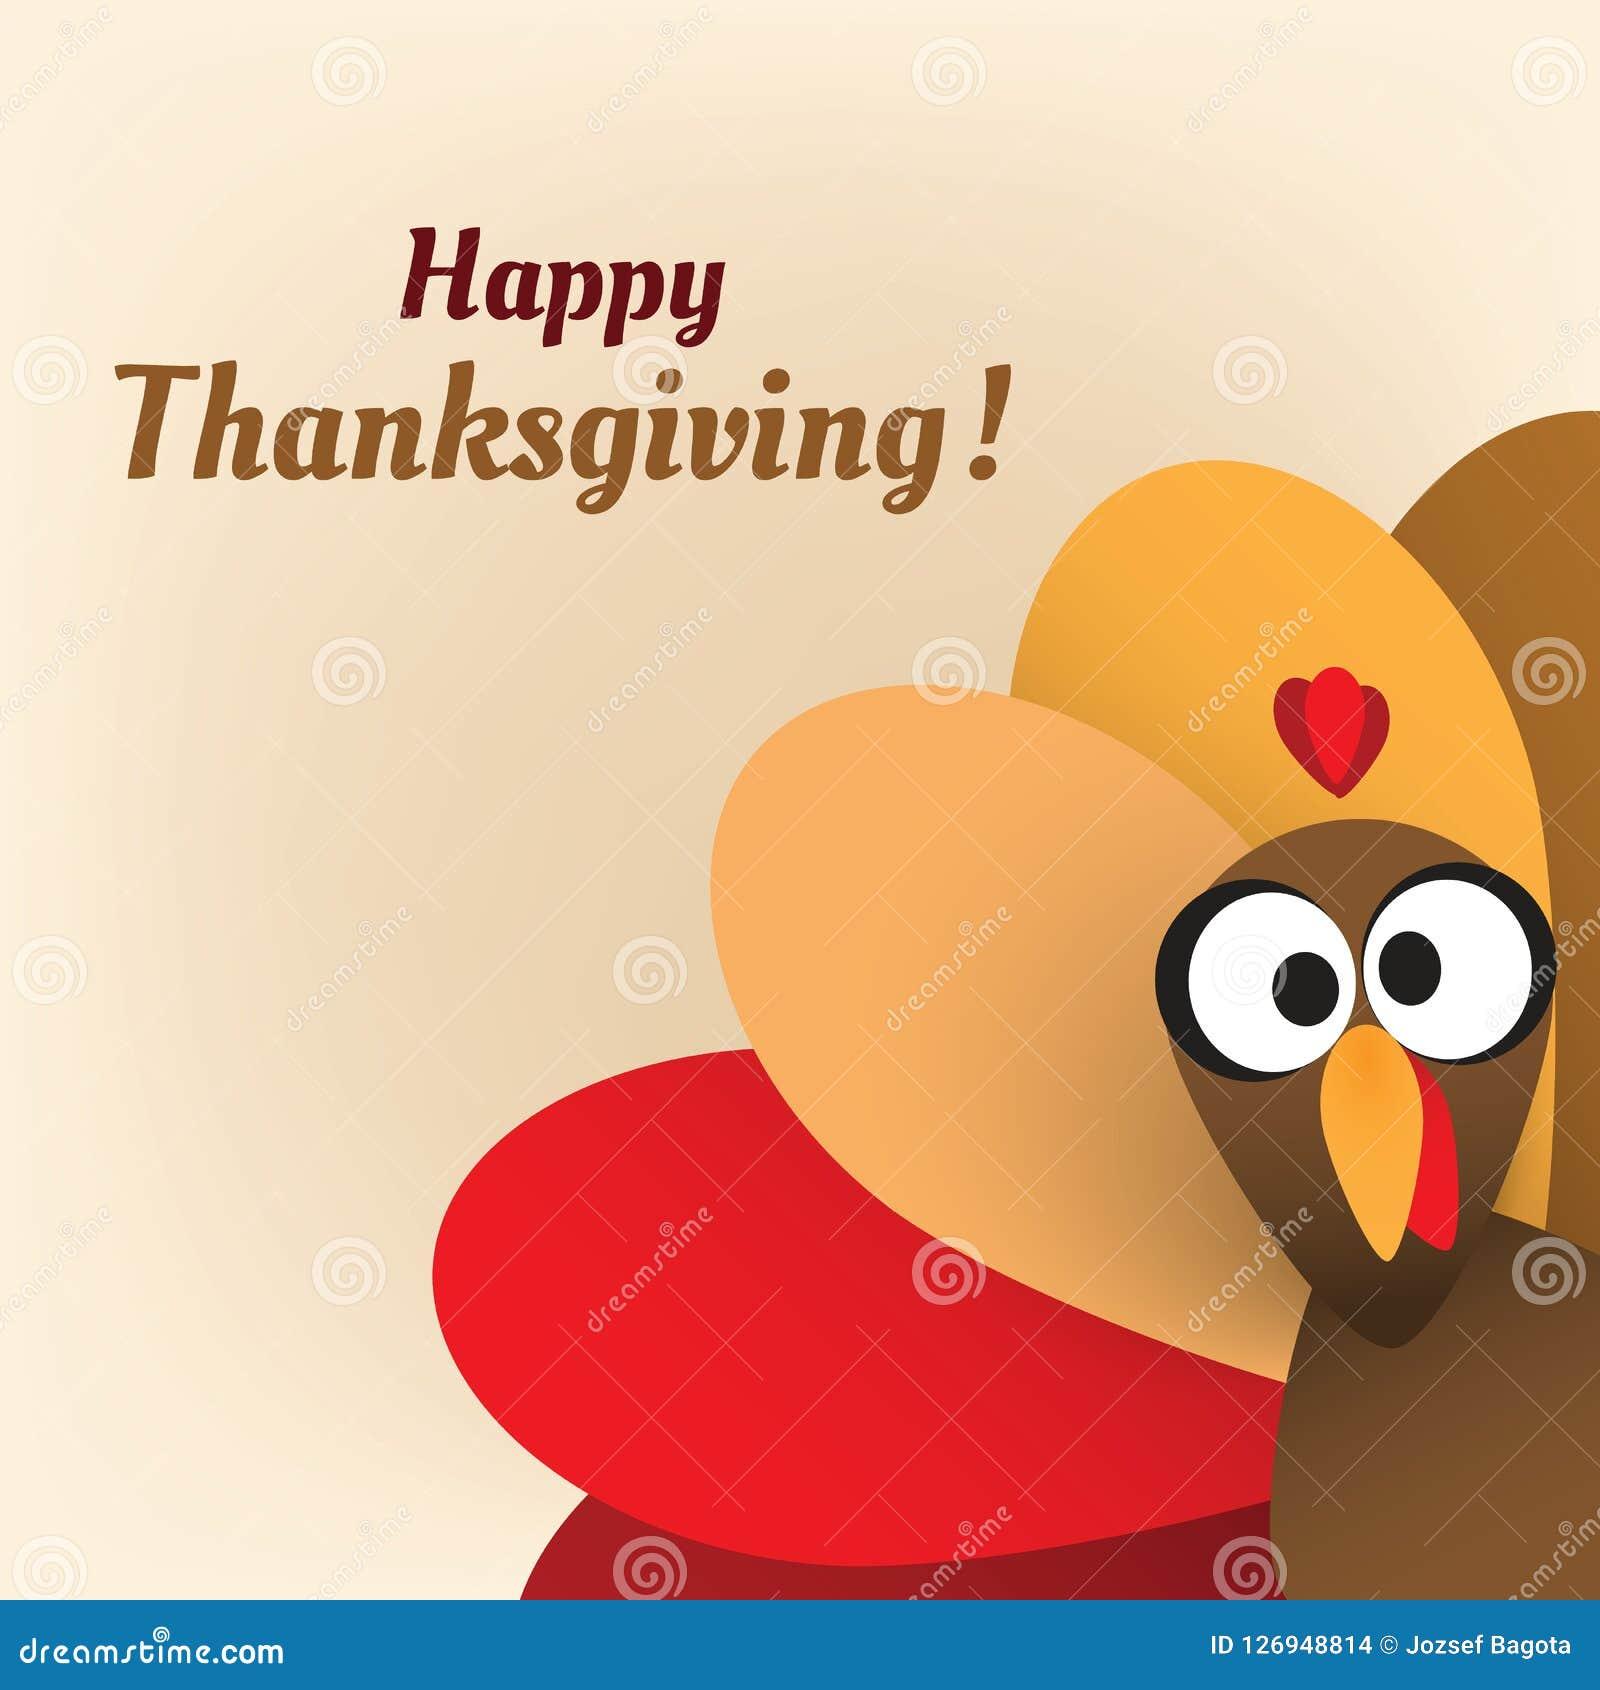 happy thanksgiving card design template stock vector illustration